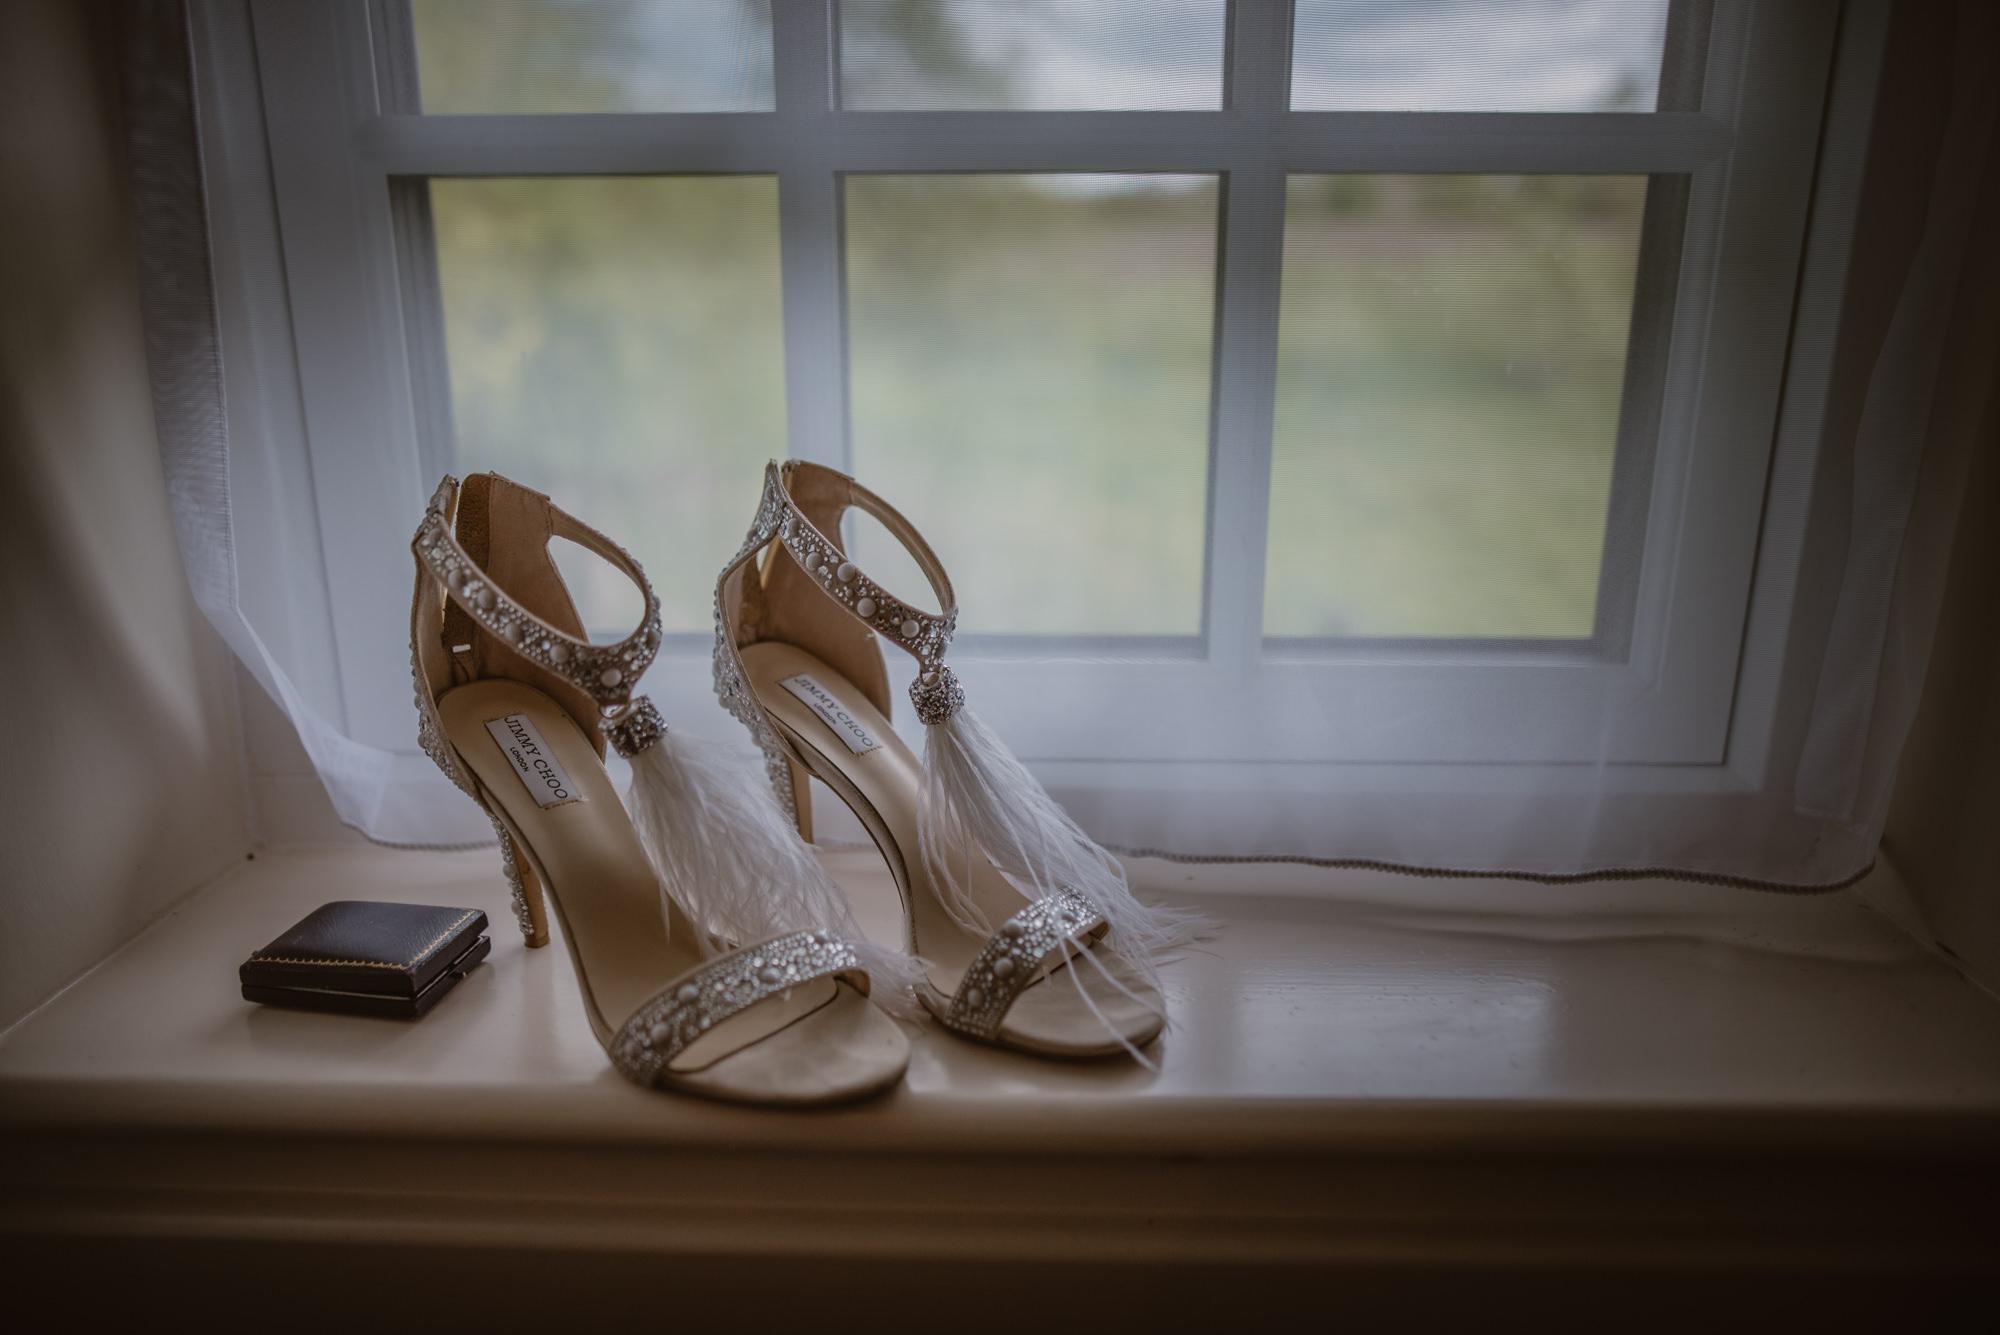 Jacqueline-Gareth-Wedding-Westmead-Events-Surrey-Manu-Mendoza-Wedding-Photography-095.jpg